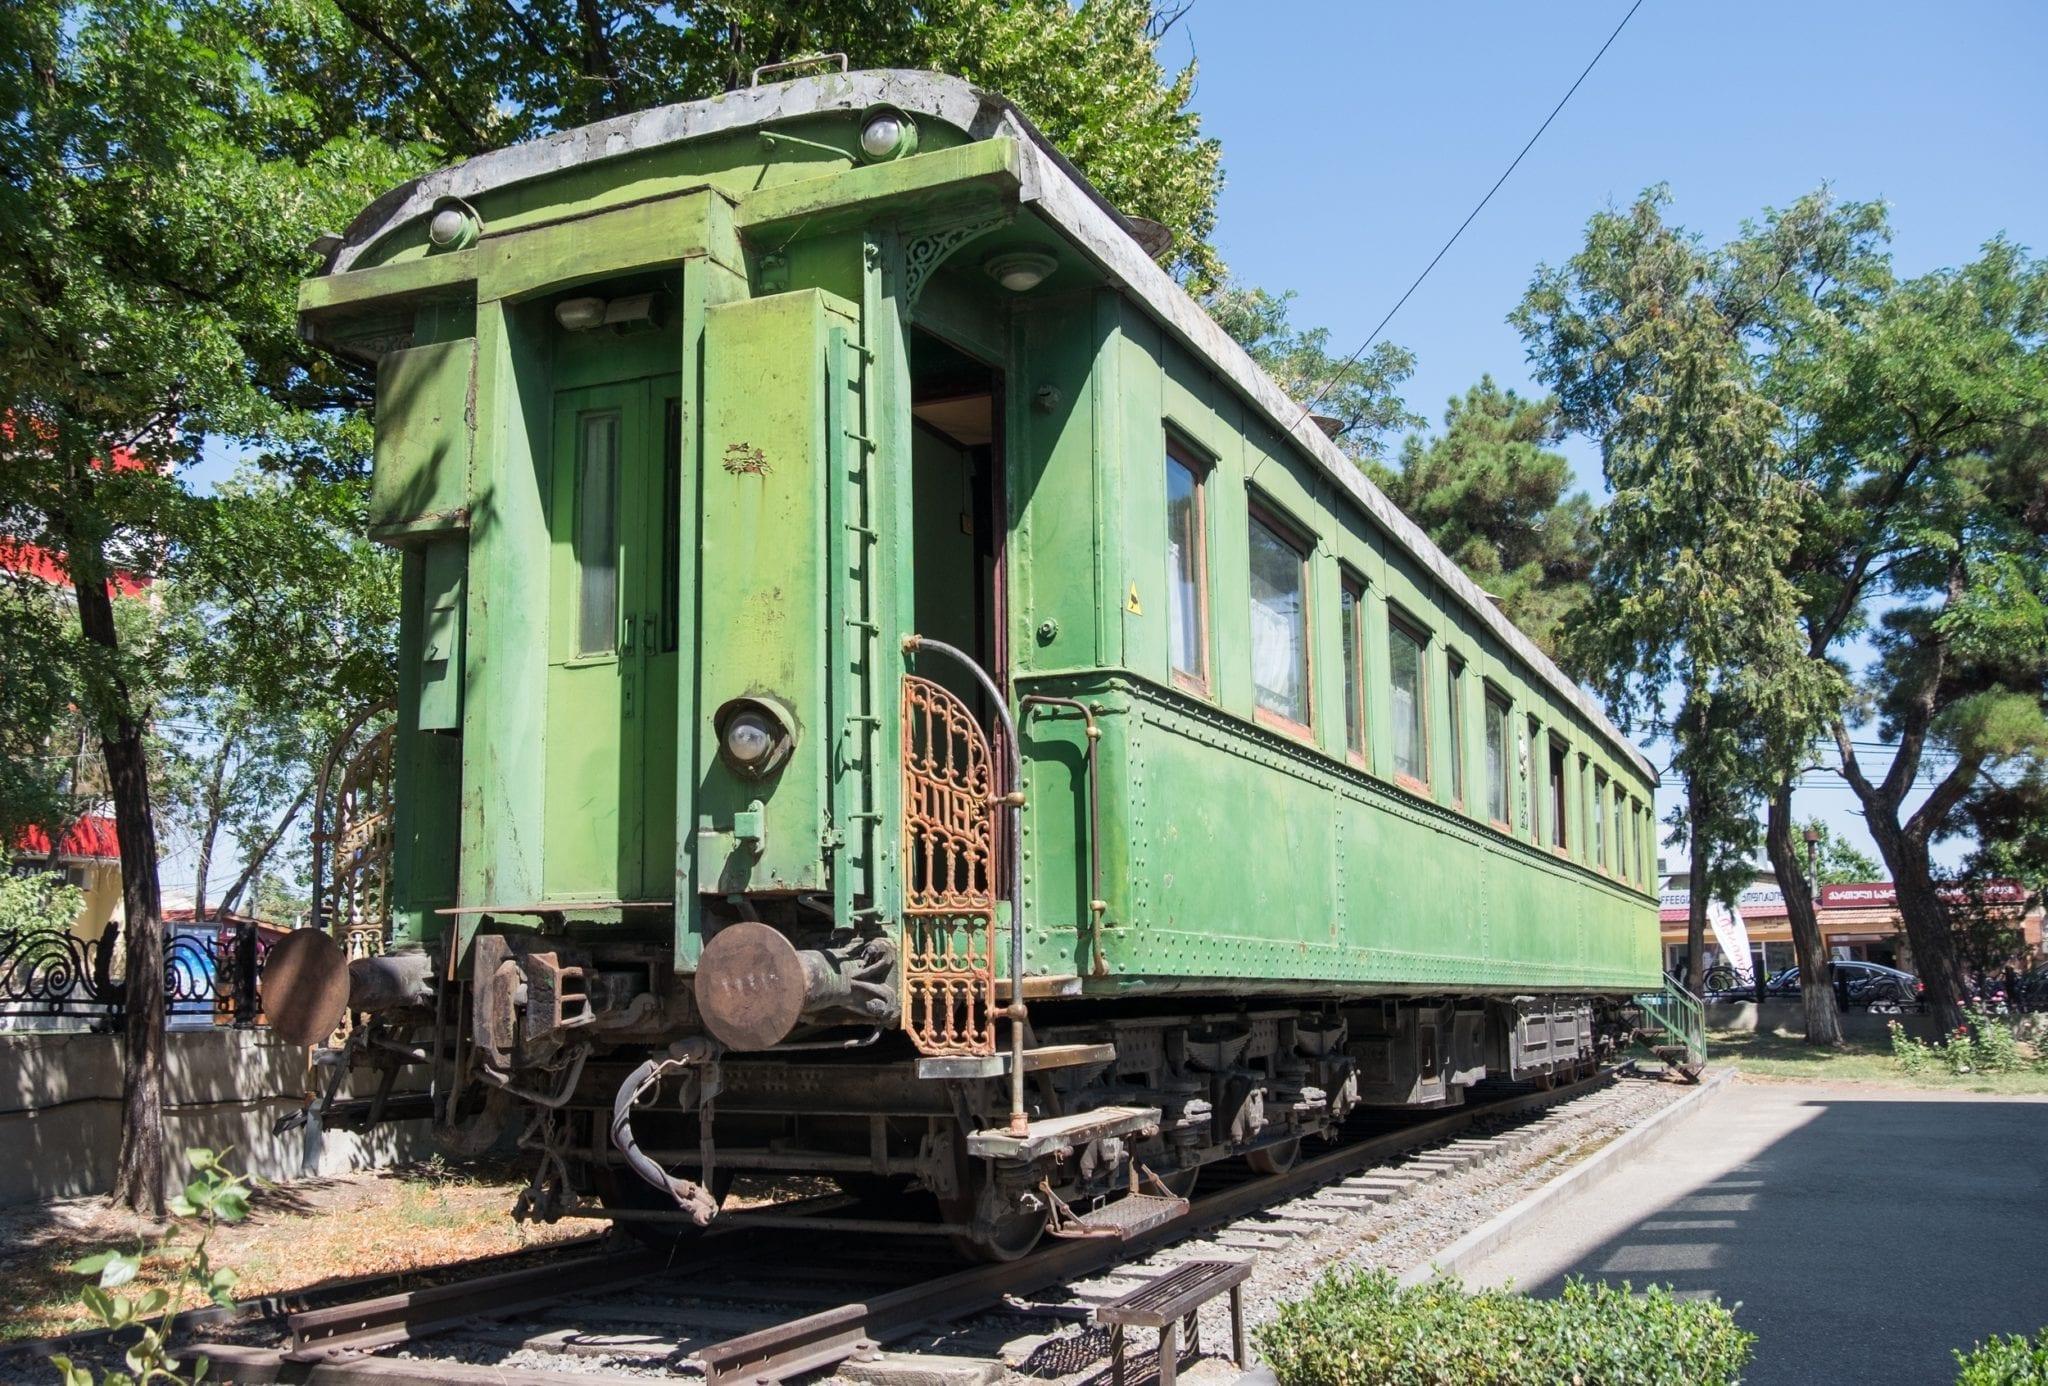 A bright green train car sitting on tracks. The train was Stalin's.